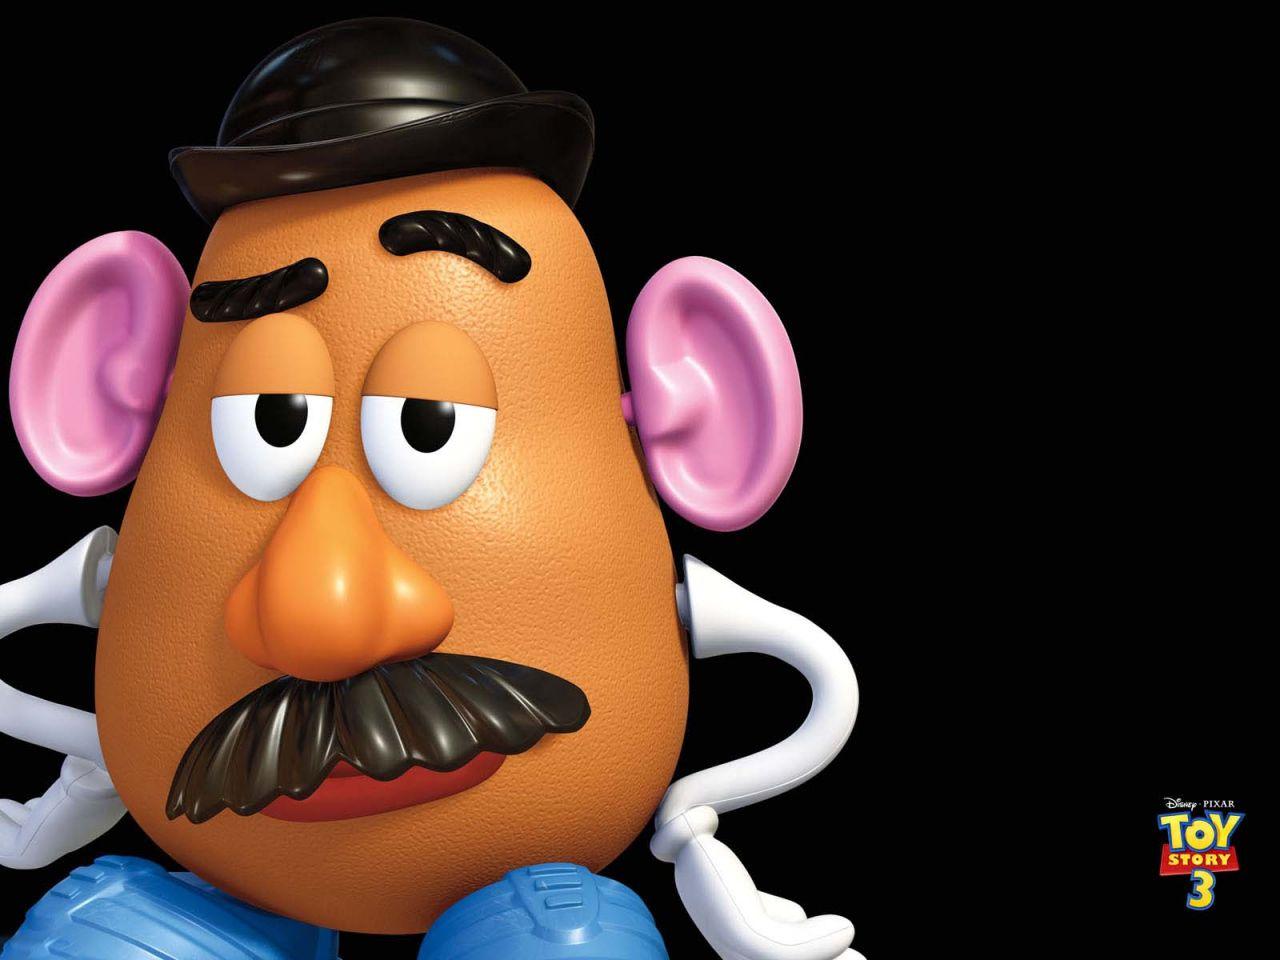 Mr Potatohead Headshot Wallpaper 1280x960